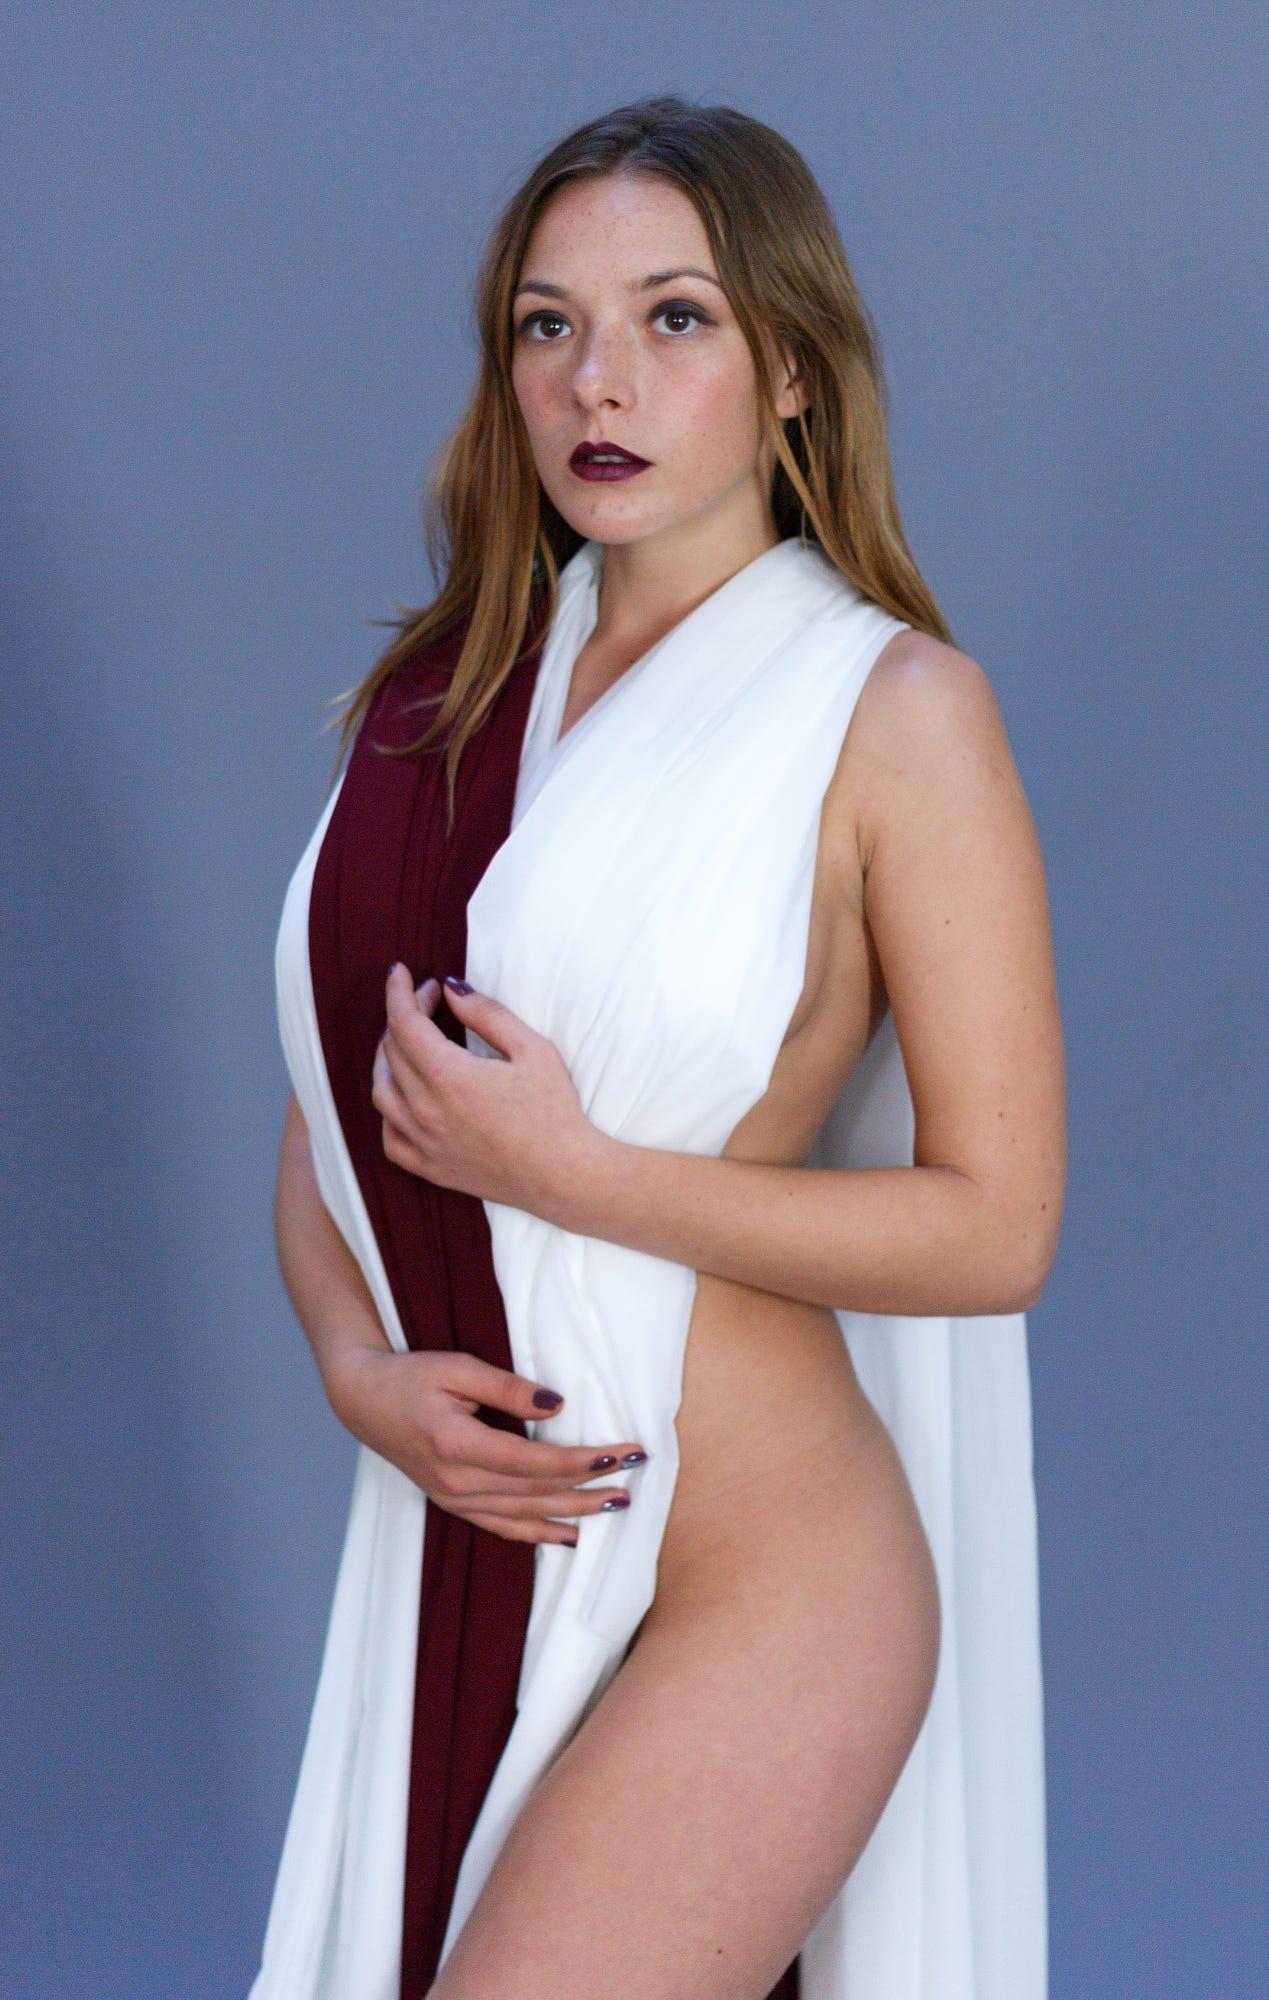 Bikini Olga Kobzar nudes (99 foto and video), Pussy, Hot, Boobs, cleavage 2019